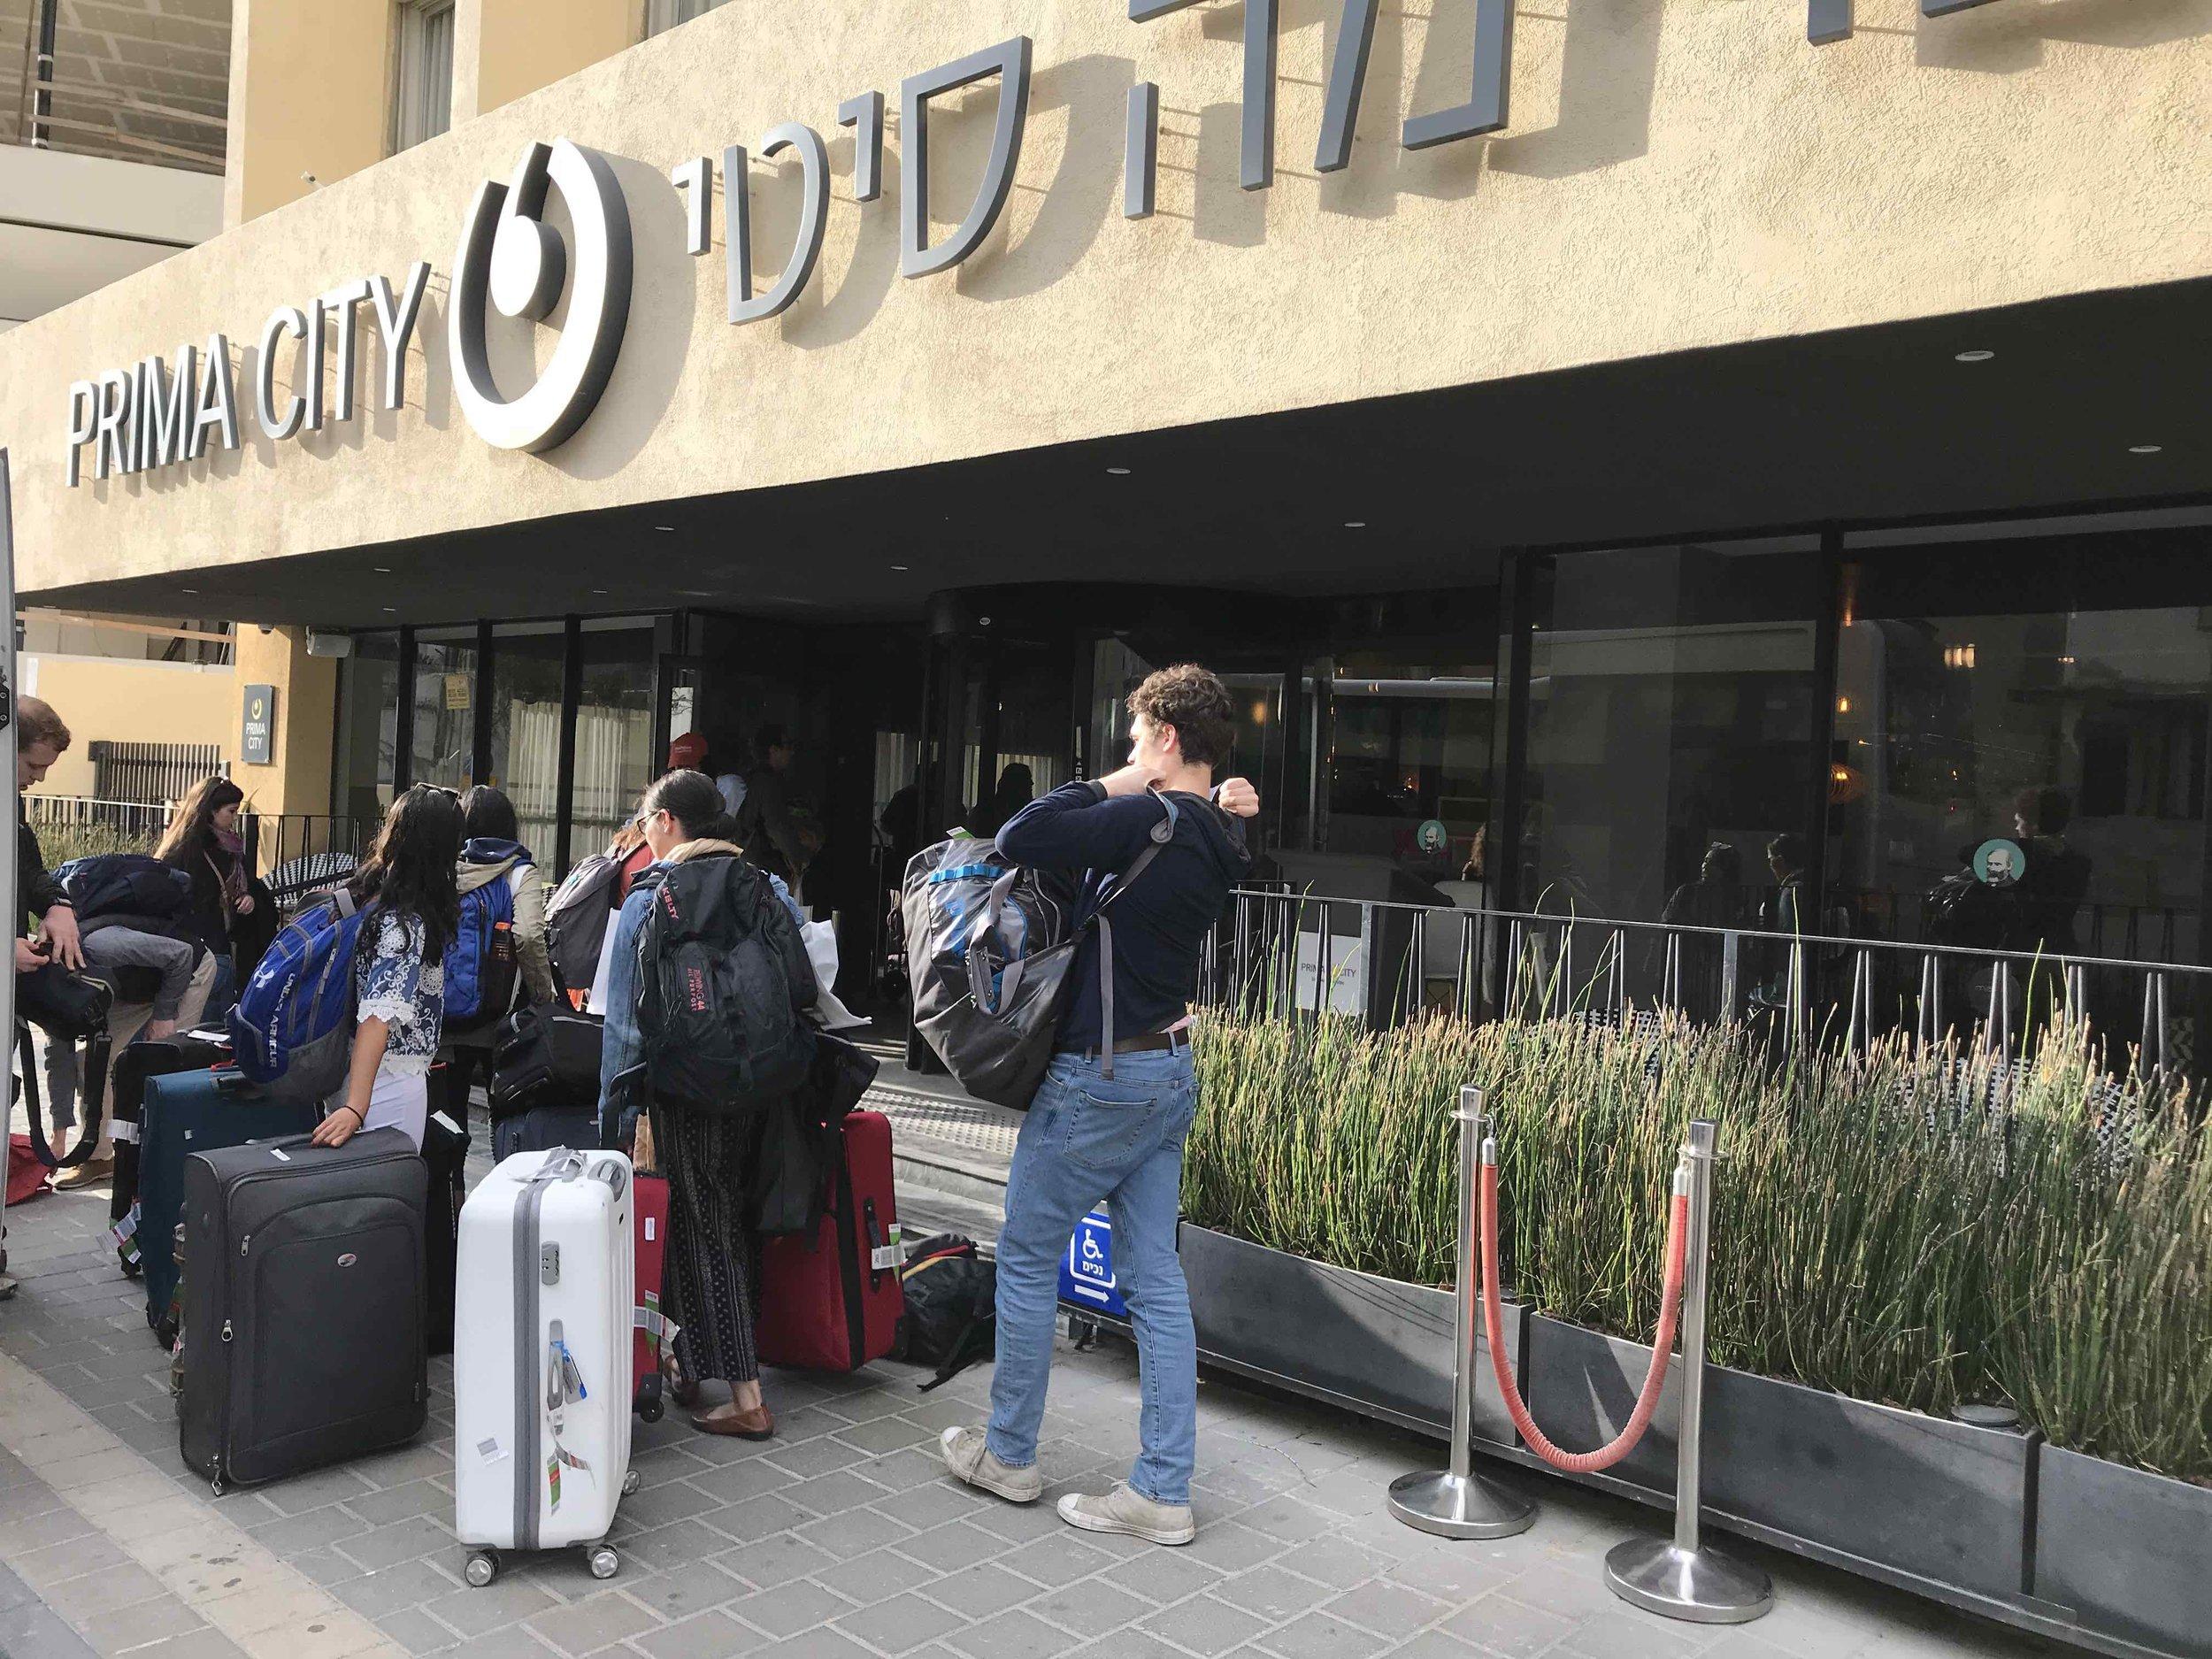 IMG_0833 lower quality checking in to tel aviv hotel.jpg